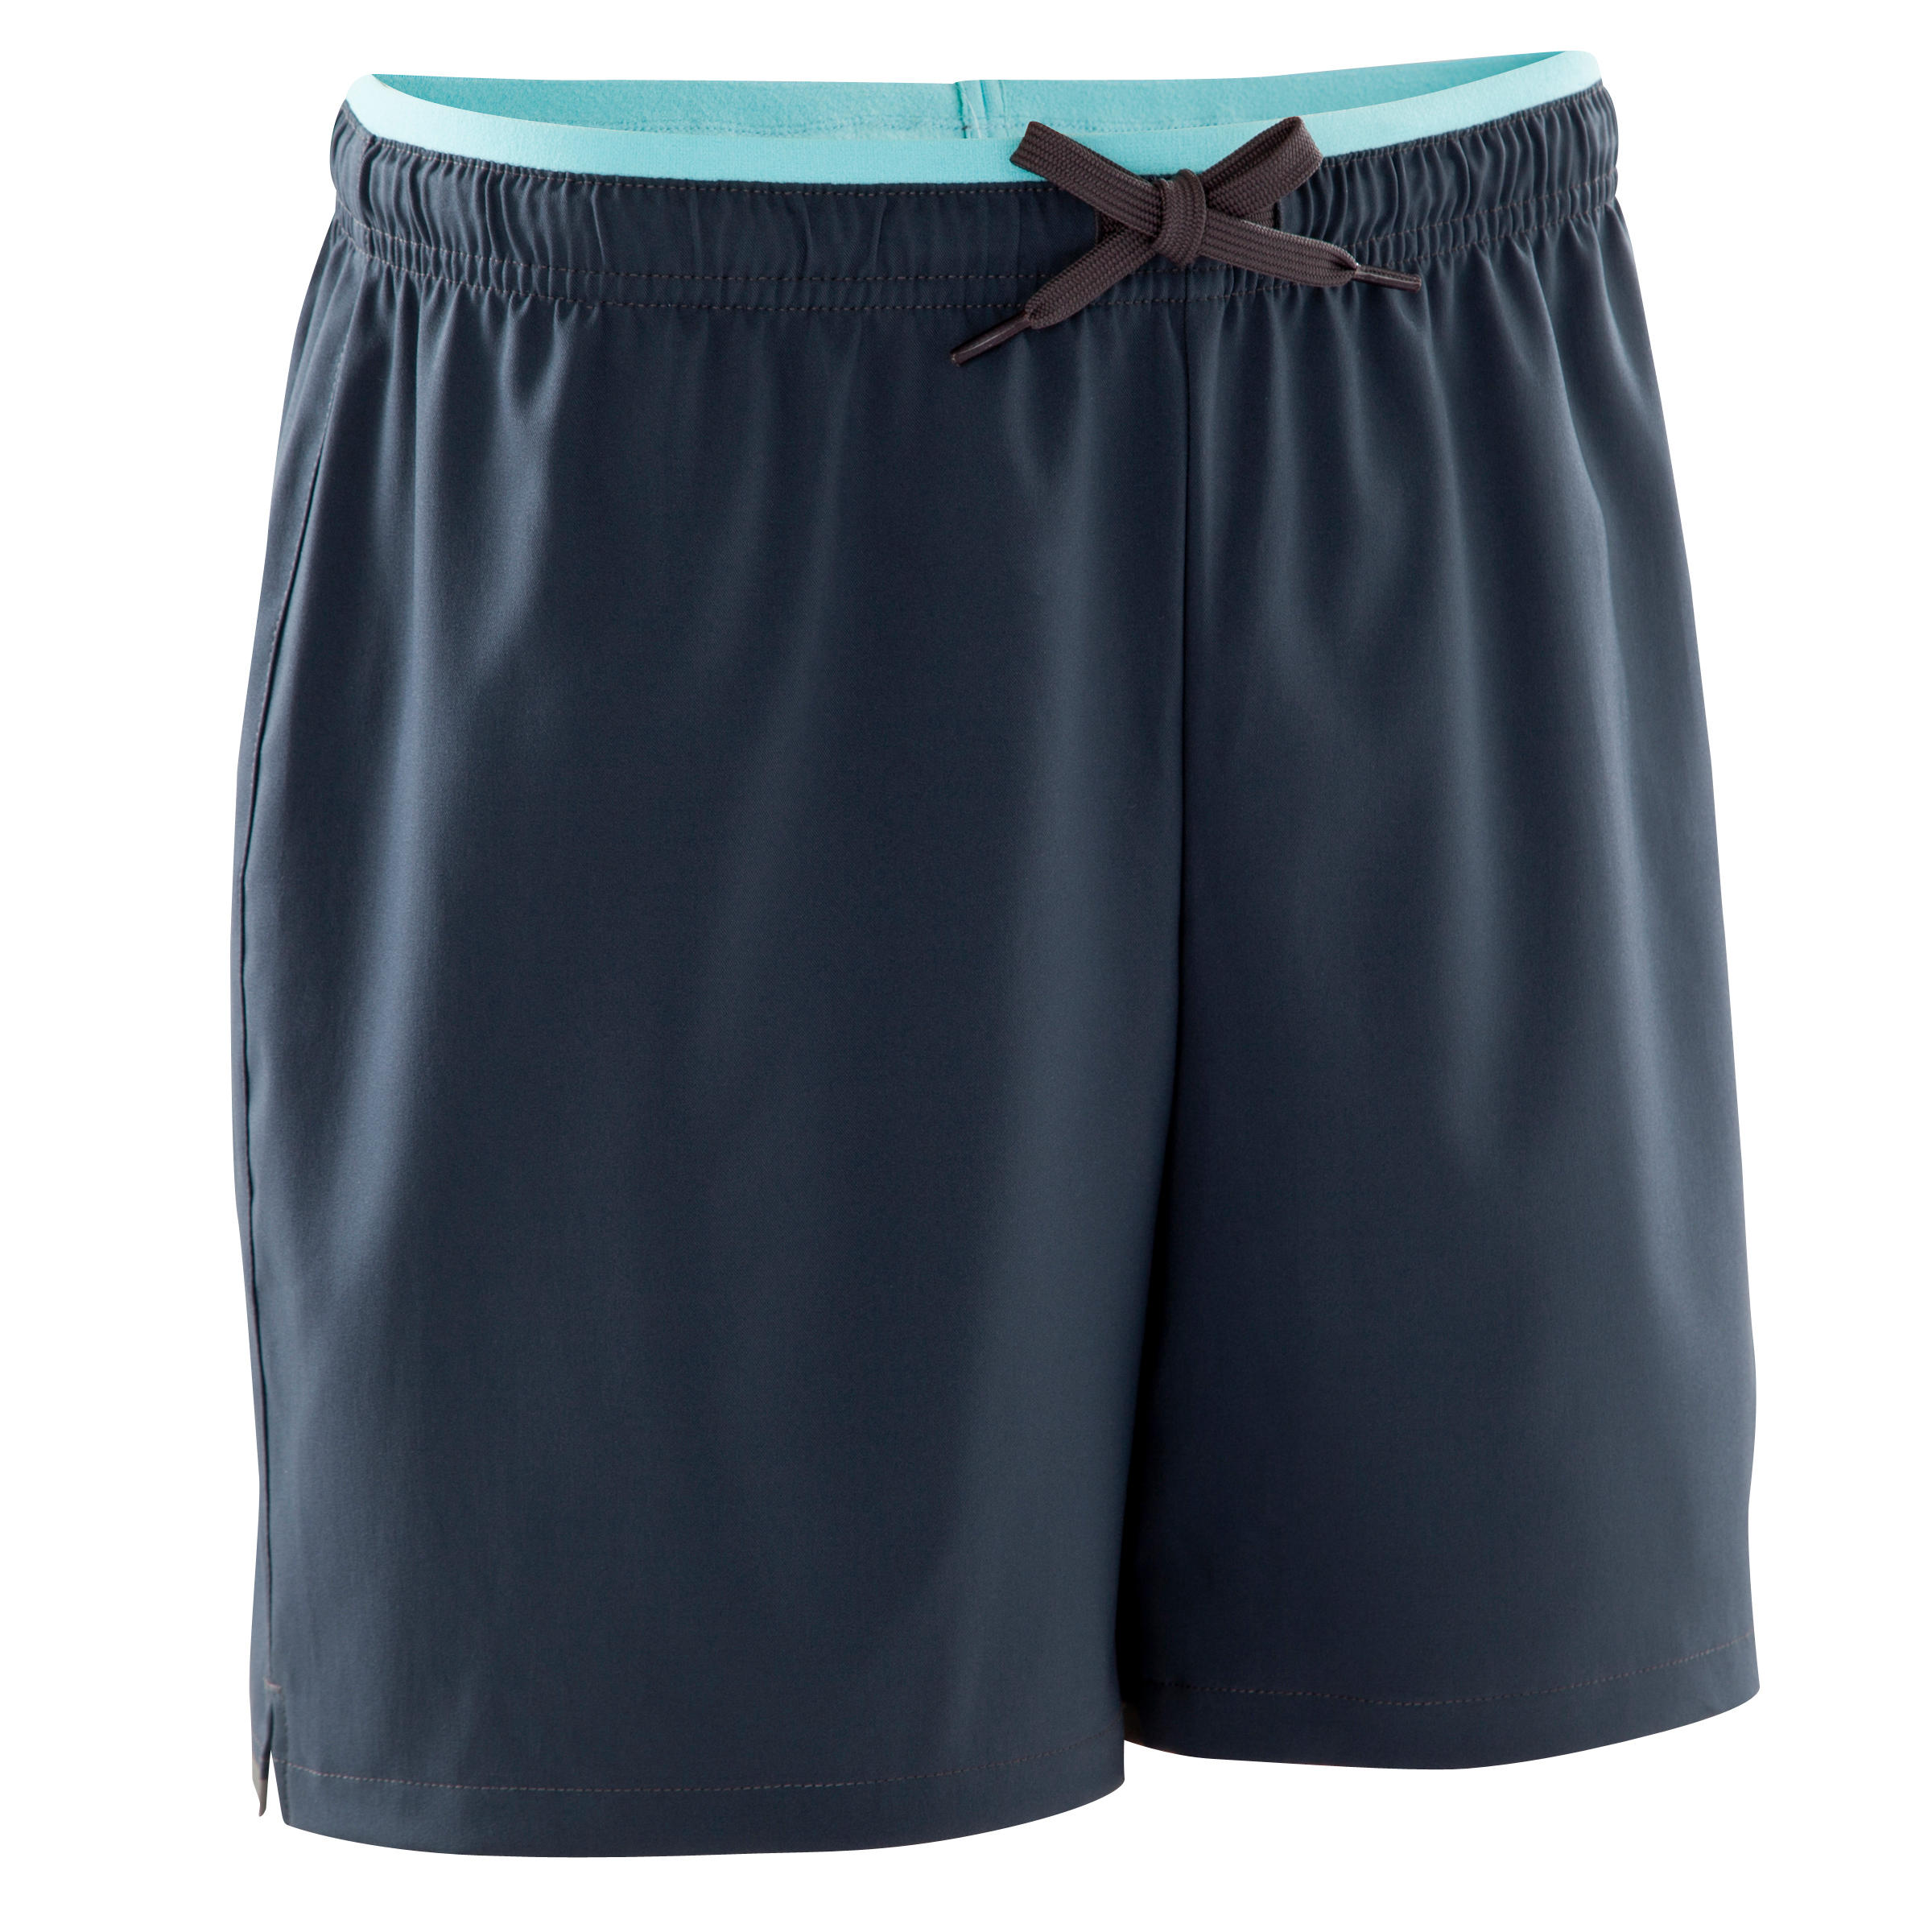 F500 Women's Soccer Shorts - Grey/Mint